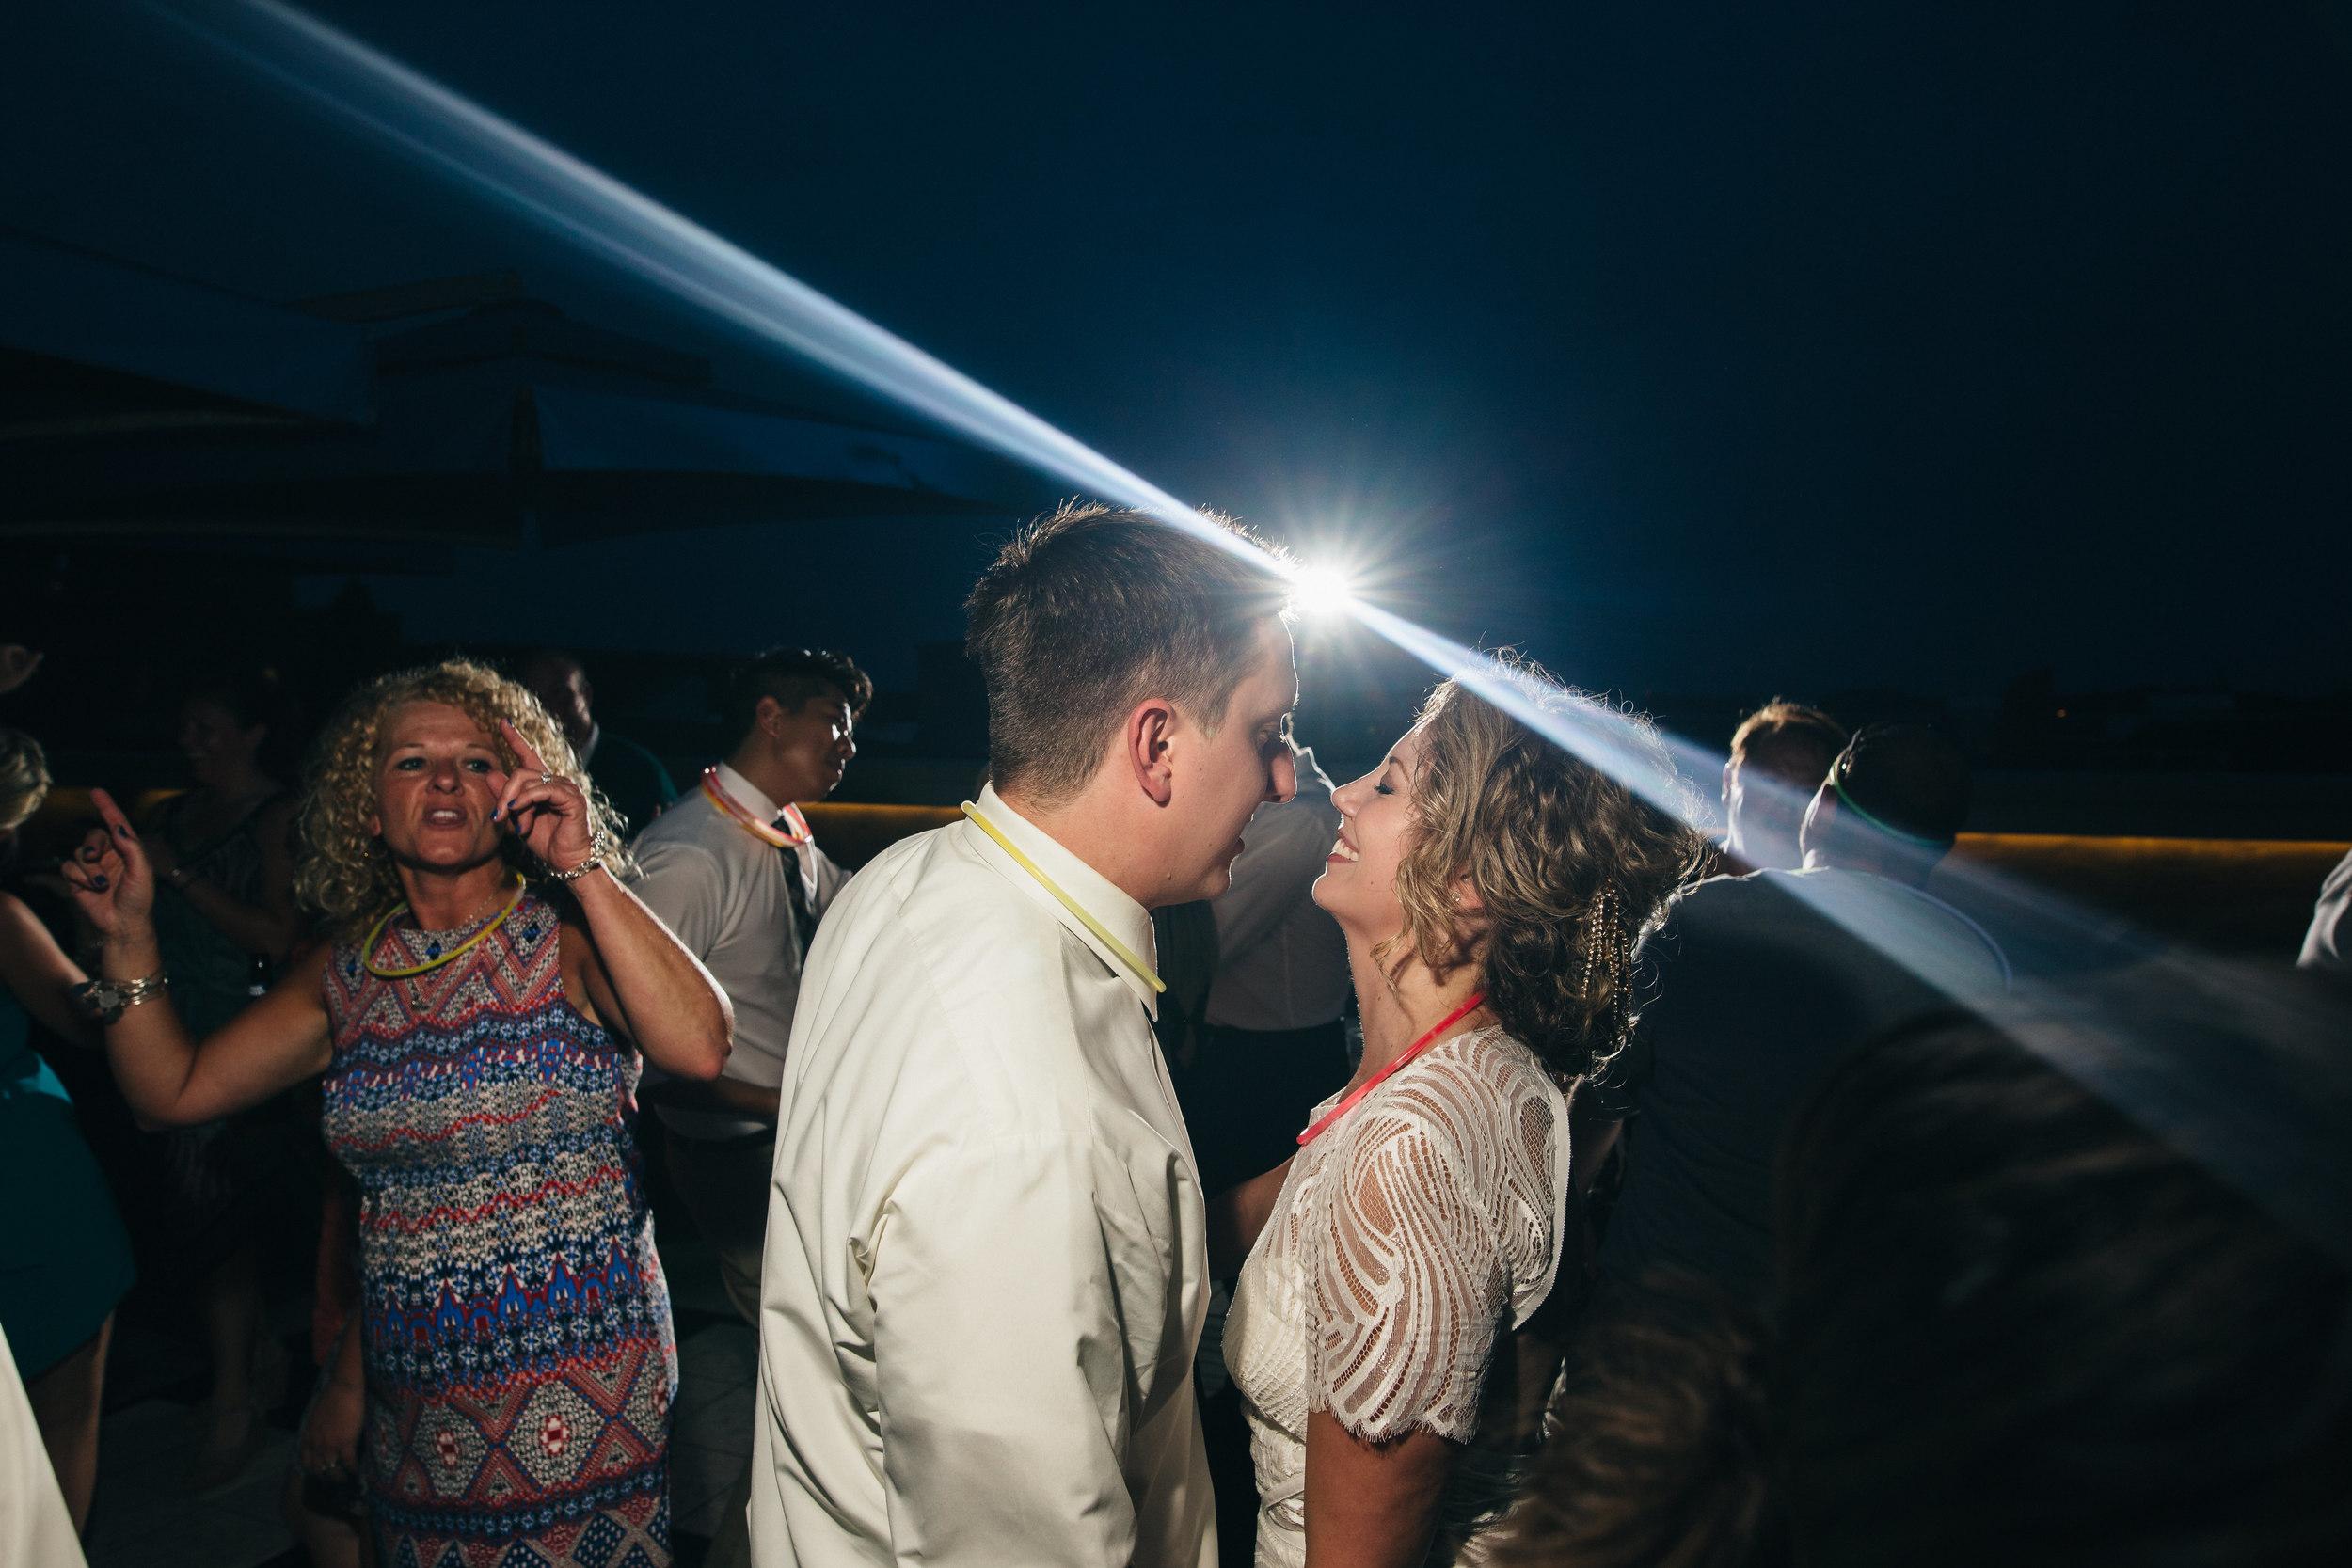 Bride and groom dancing at wedding reception in Toledo, Ohio.